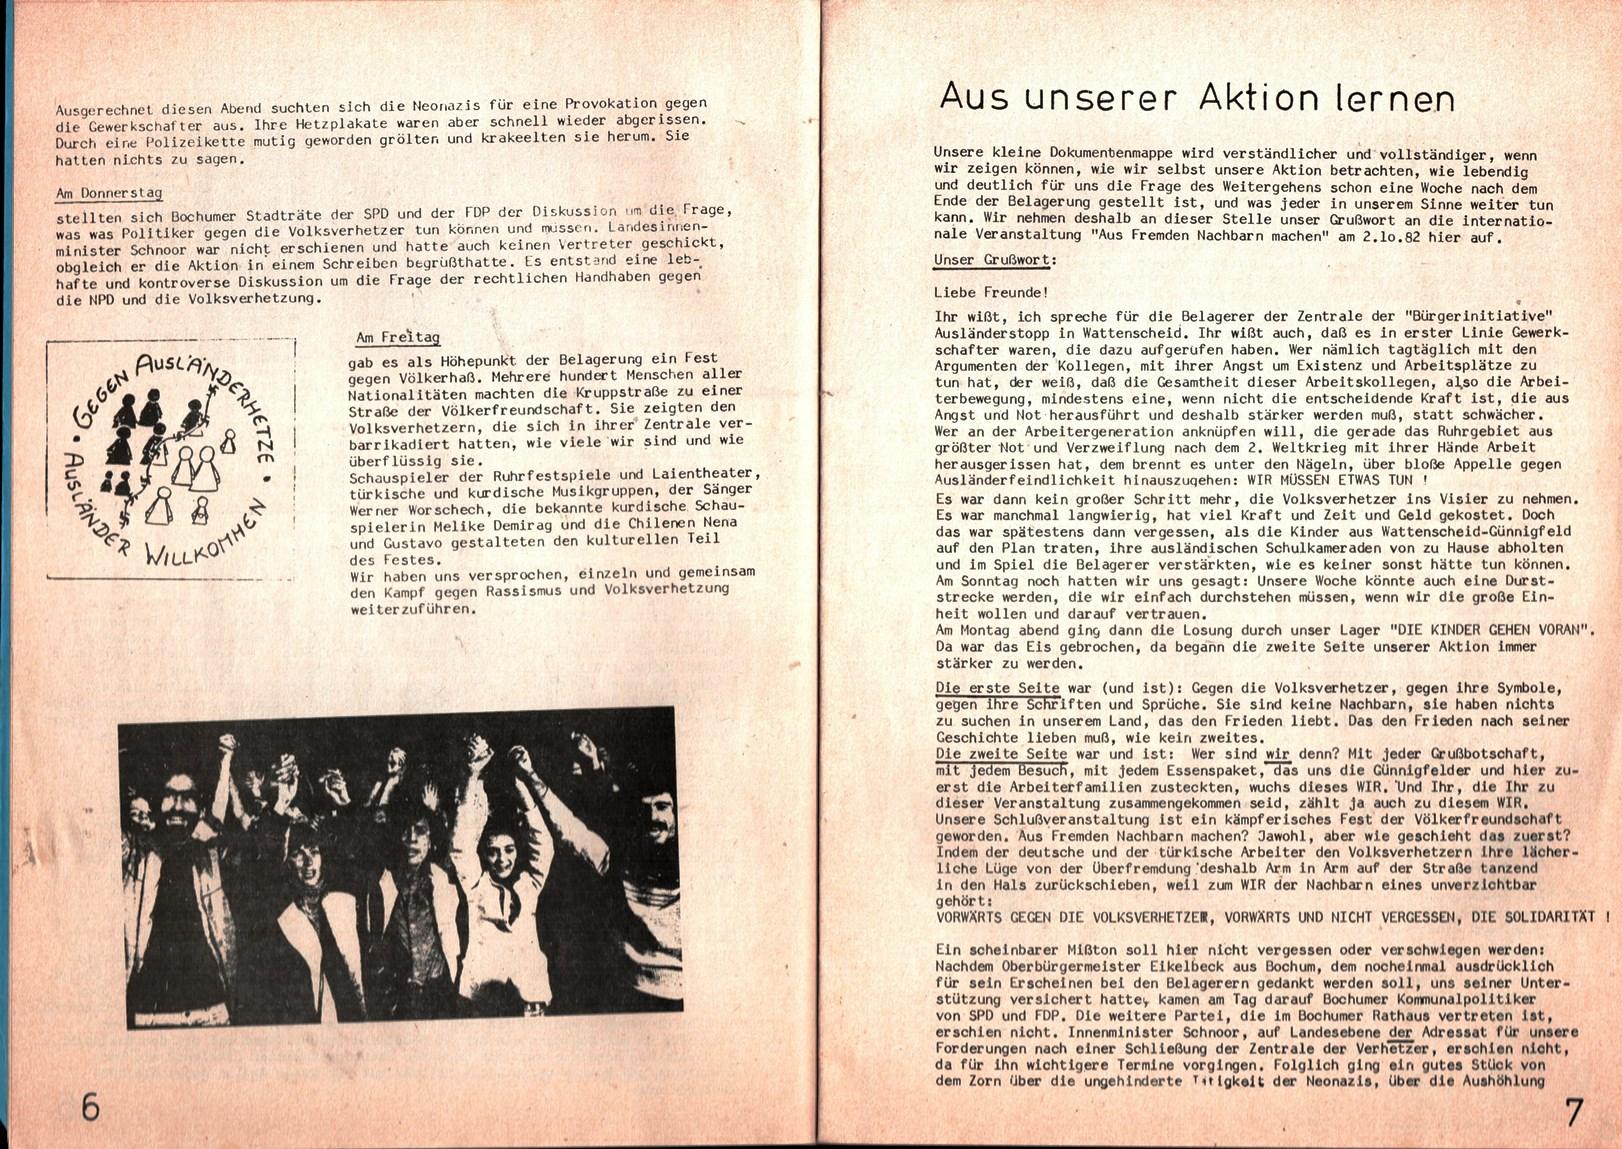 Bochum_1982_BI_Auslaenderstopp_belagern_005